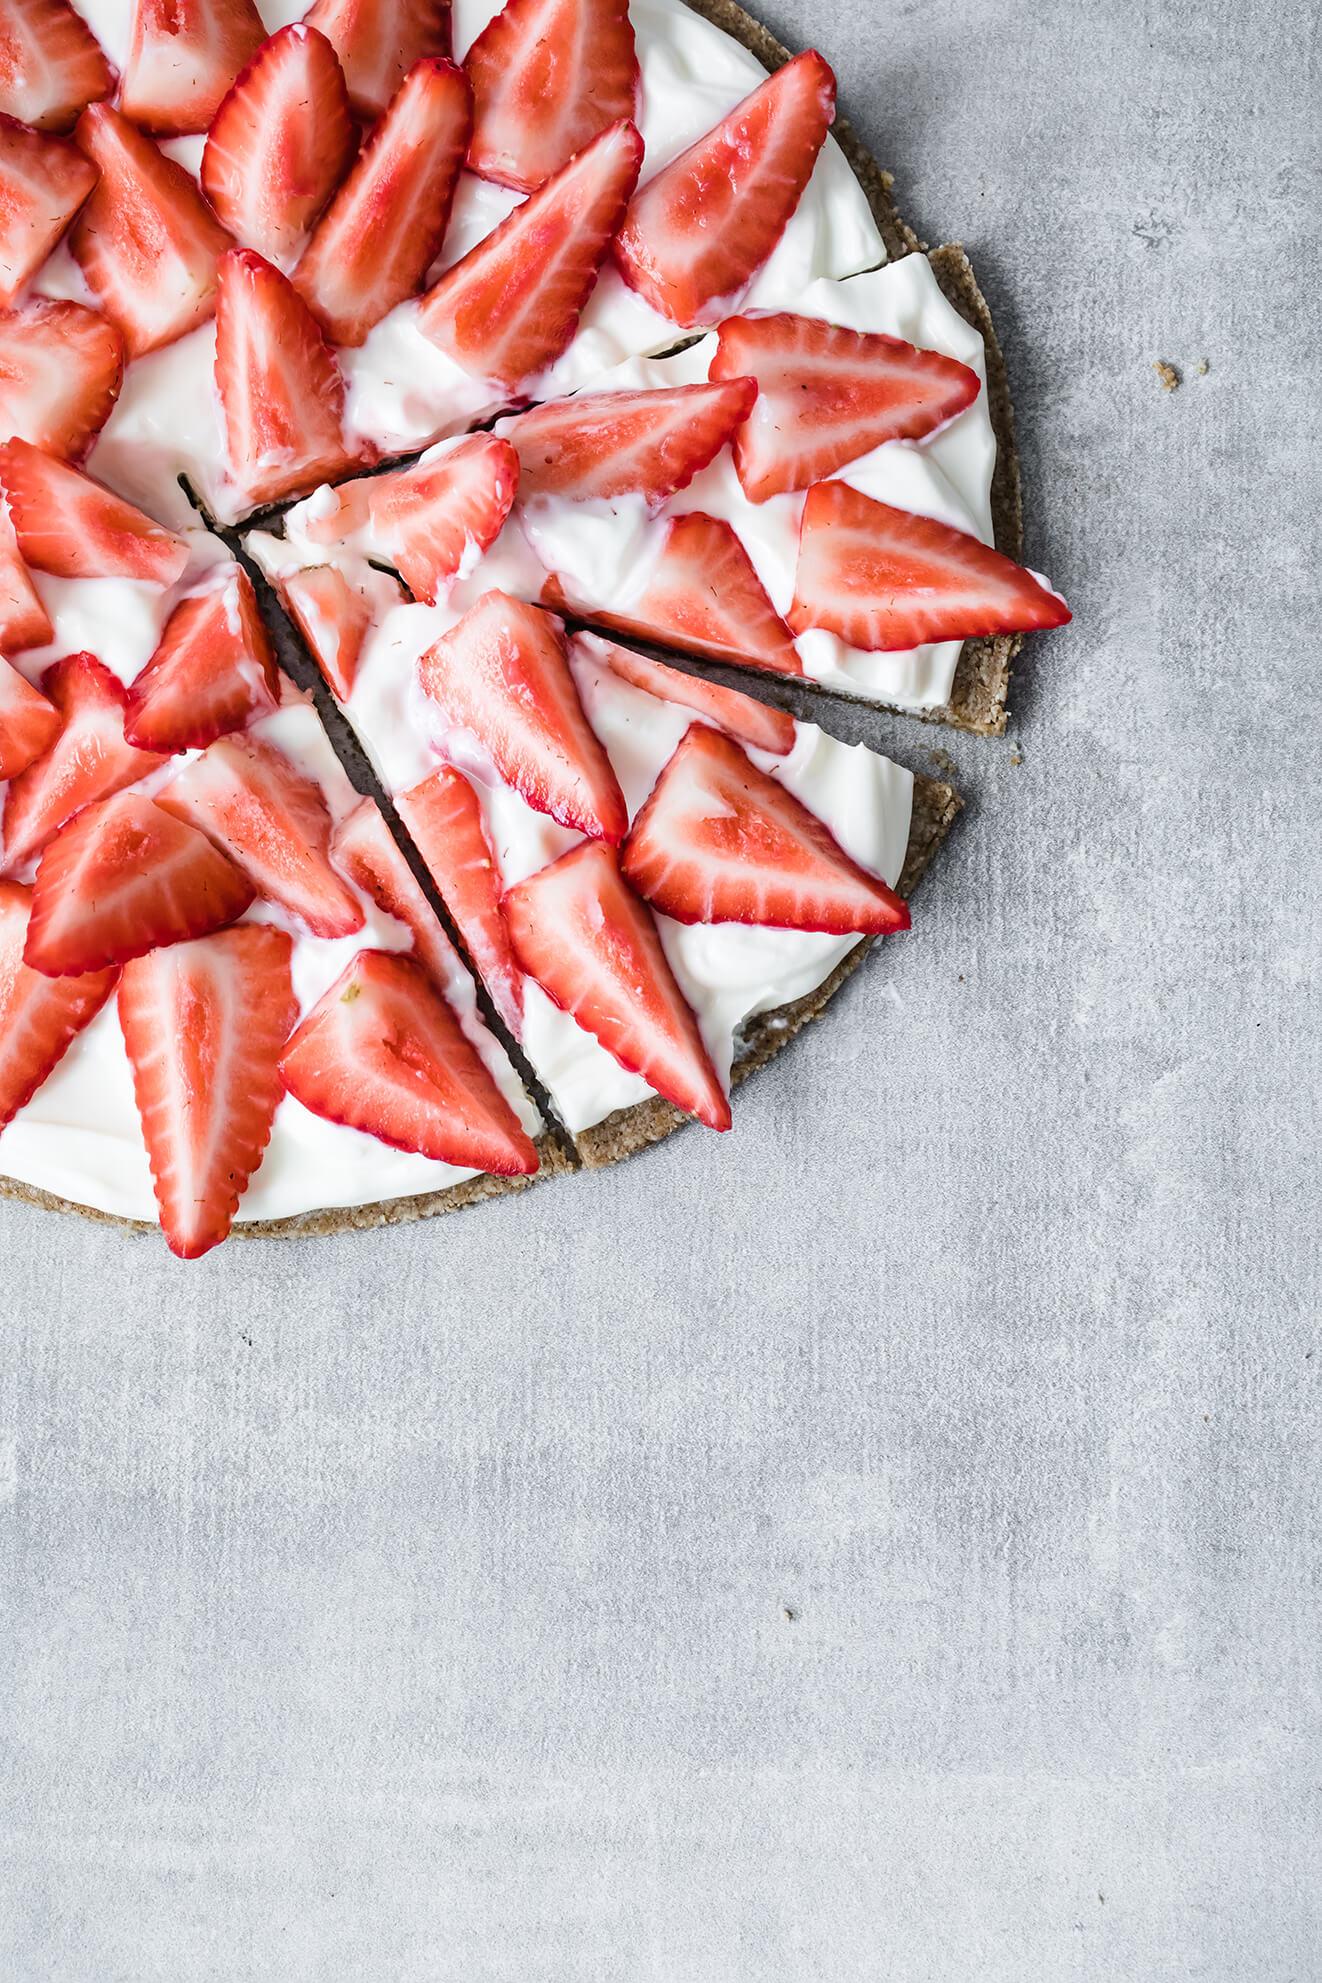 Keto Vegan Strawberry Slice, Modern Food Stories, London Food Photographer, vegan dessert, keto dessert, strawberries and cream